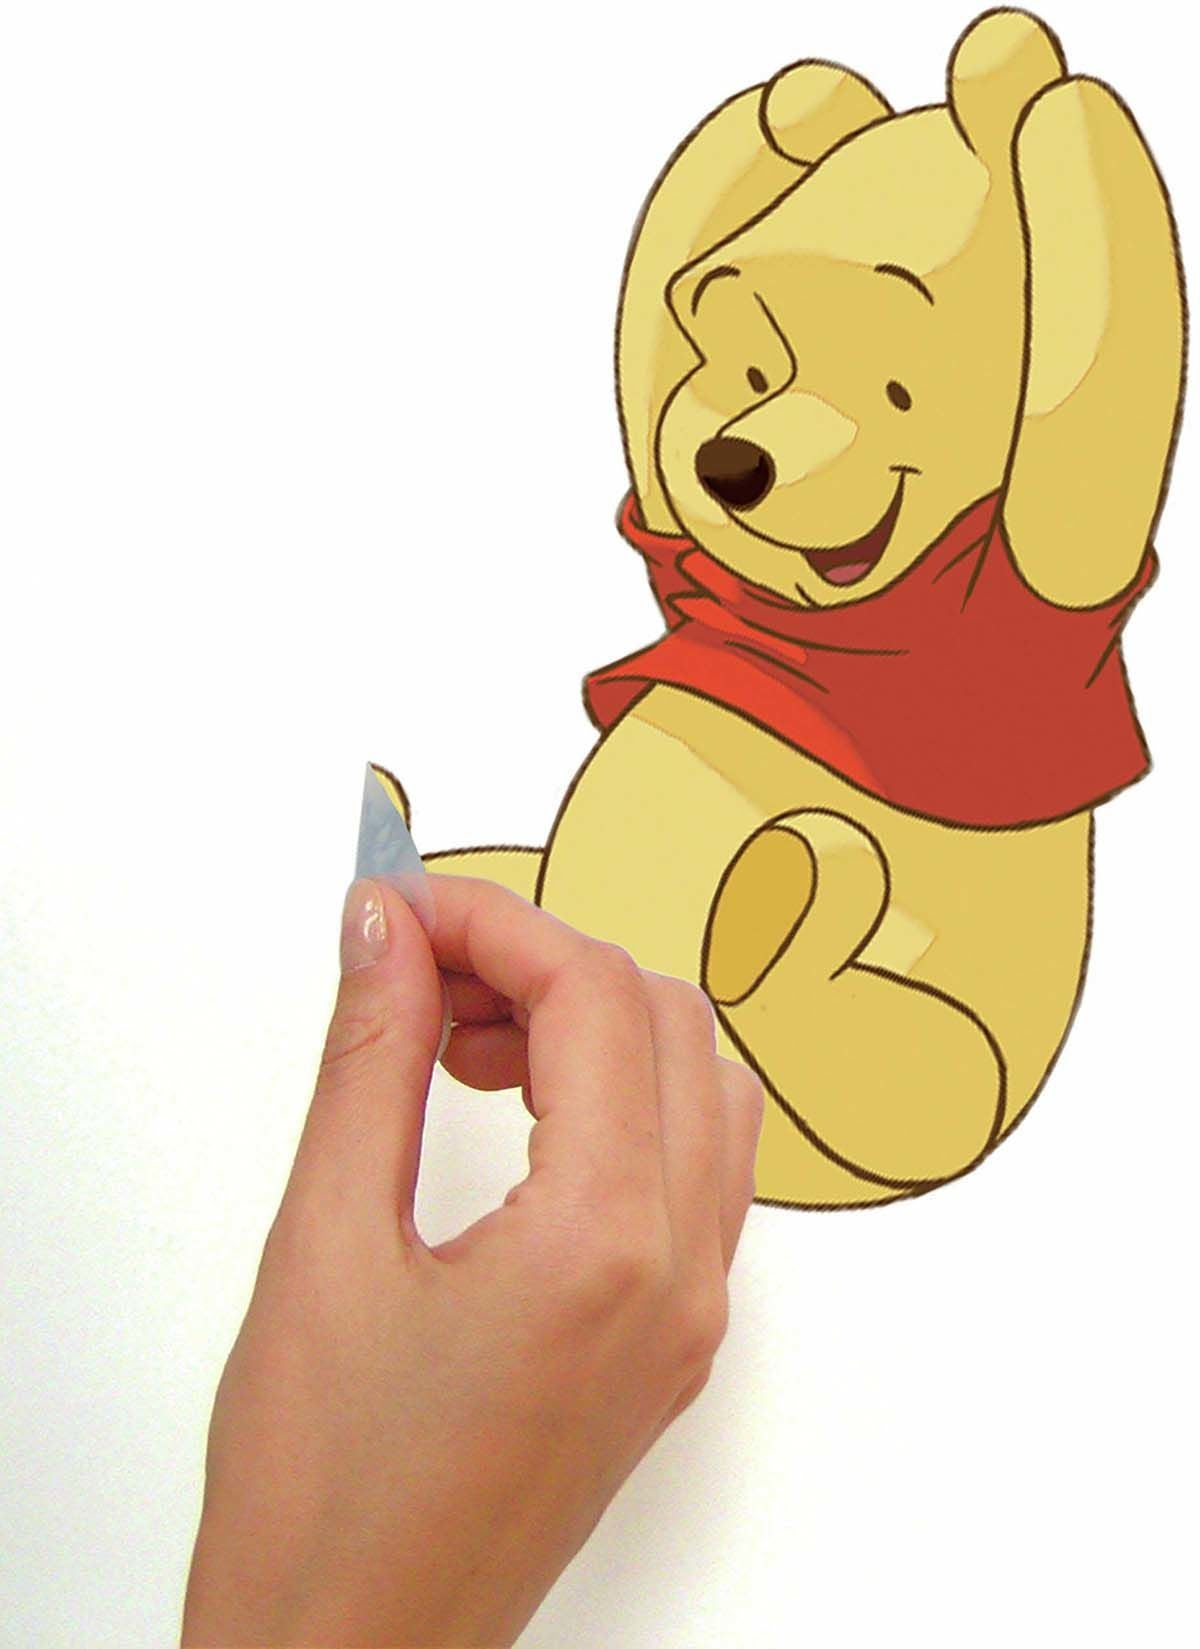 RoomMates Wallstickers Disney Nalle Puh & Vänner